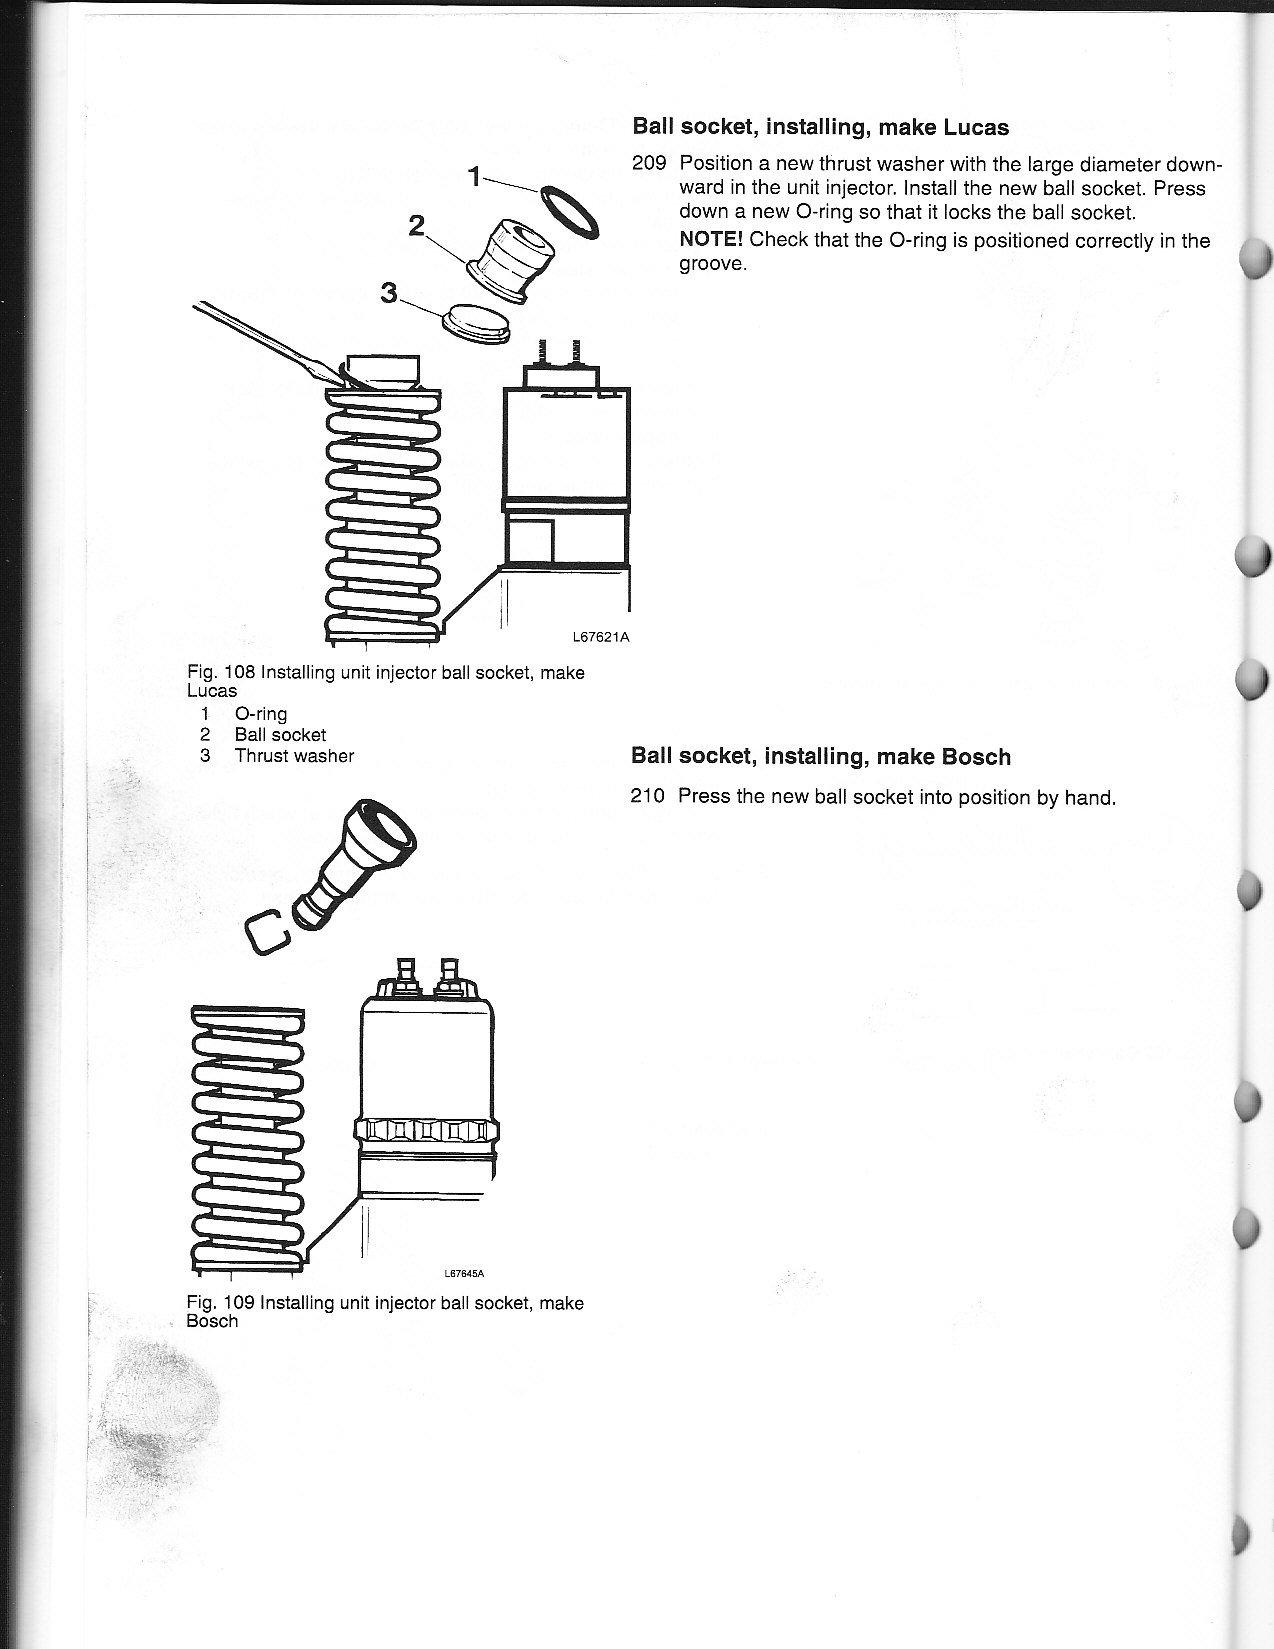 HAVE 2002 D12 ENGINE NEED INJECTOR TORQUE SPECS AND ADJUSTMENT SPEC